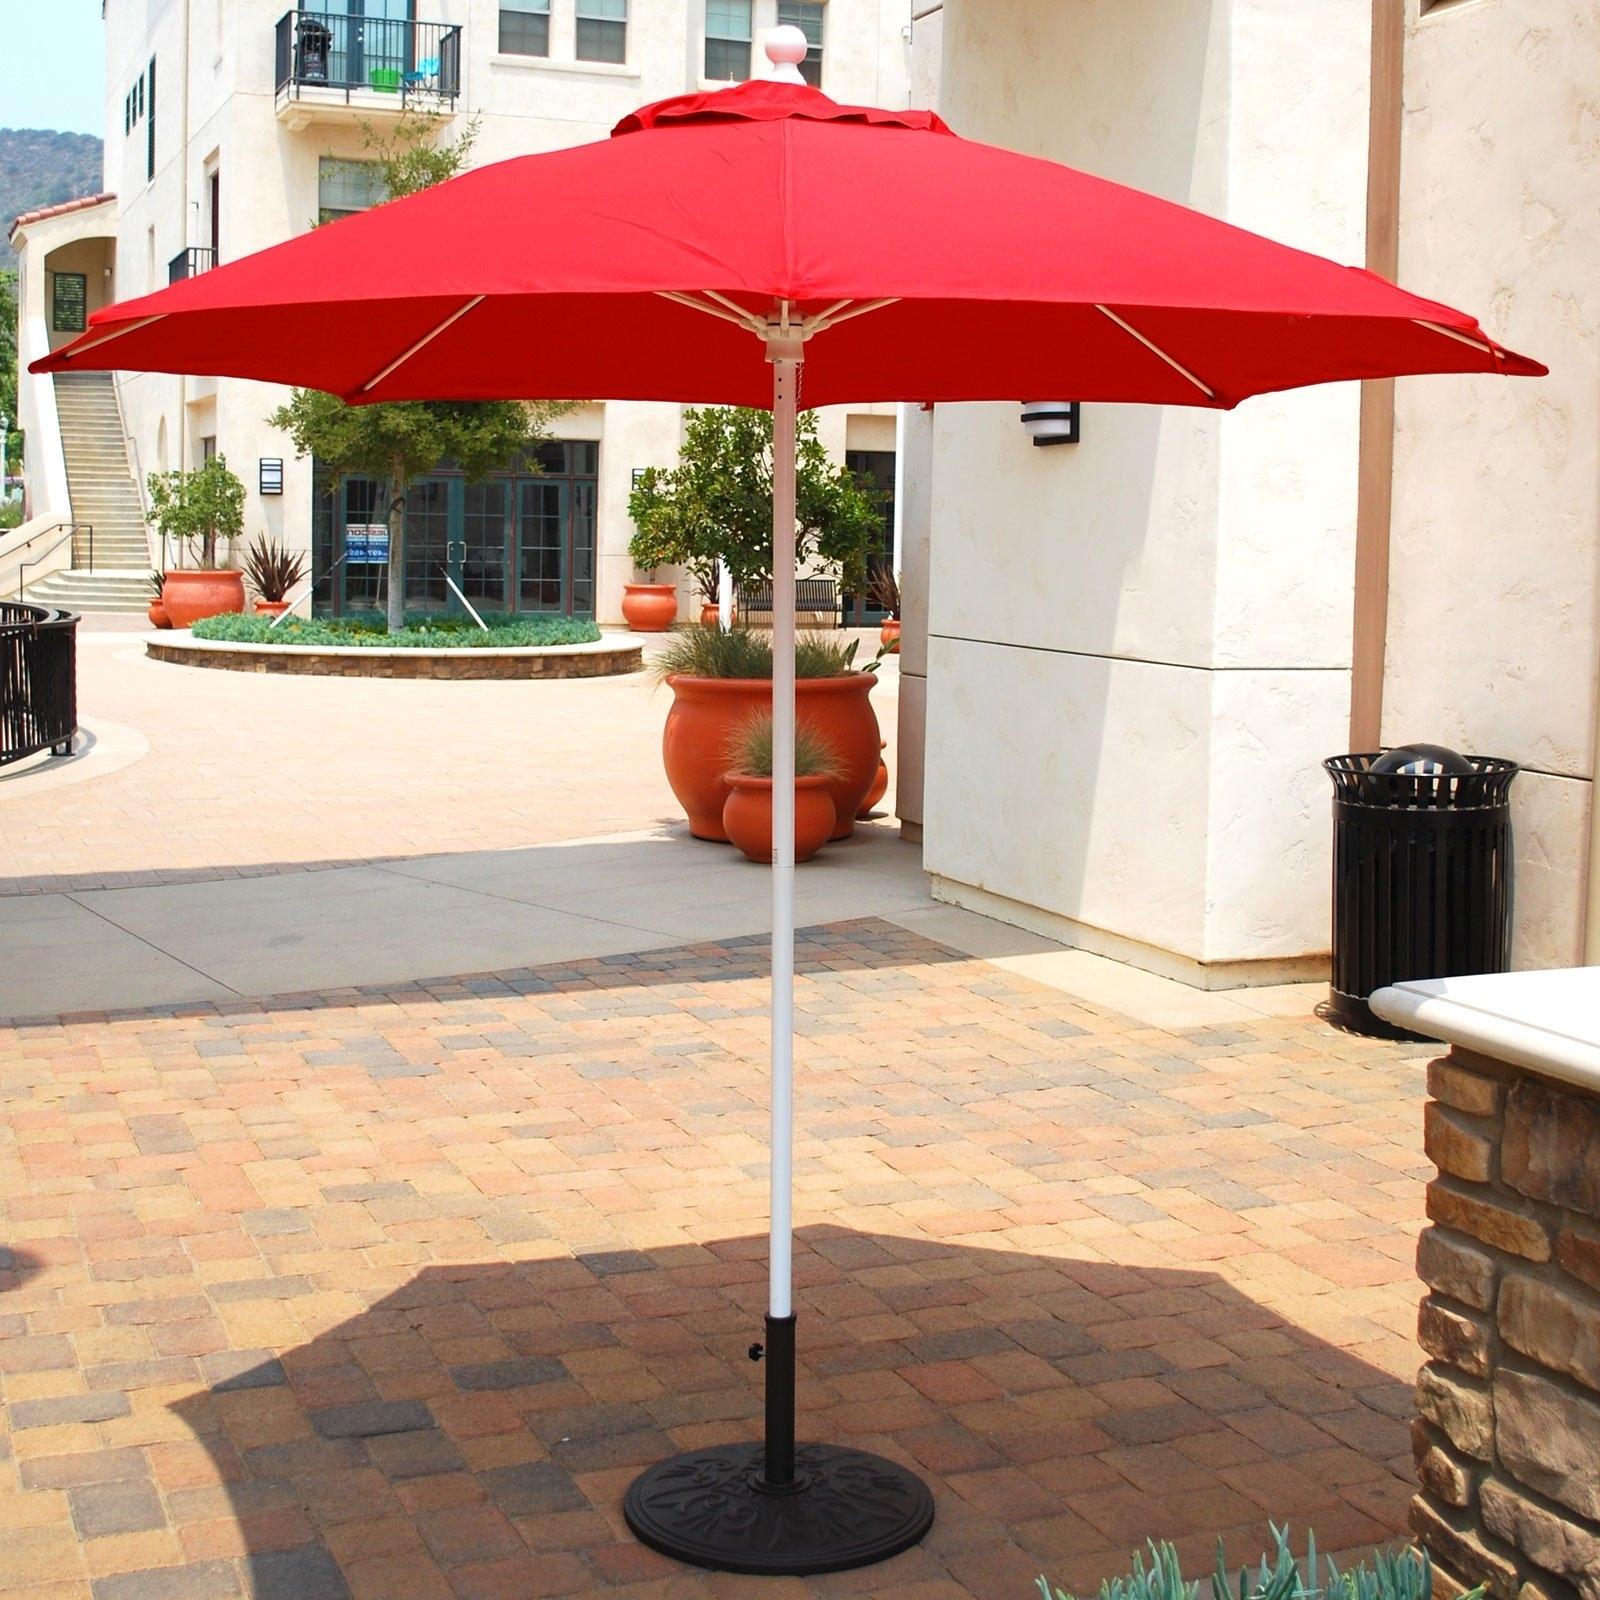 Cheap Patio Umbrellas Regarding Most Up To Date Furniture: Patio Umbrellas Home Depot Bathroom Light Christmas (View 8 of 20)